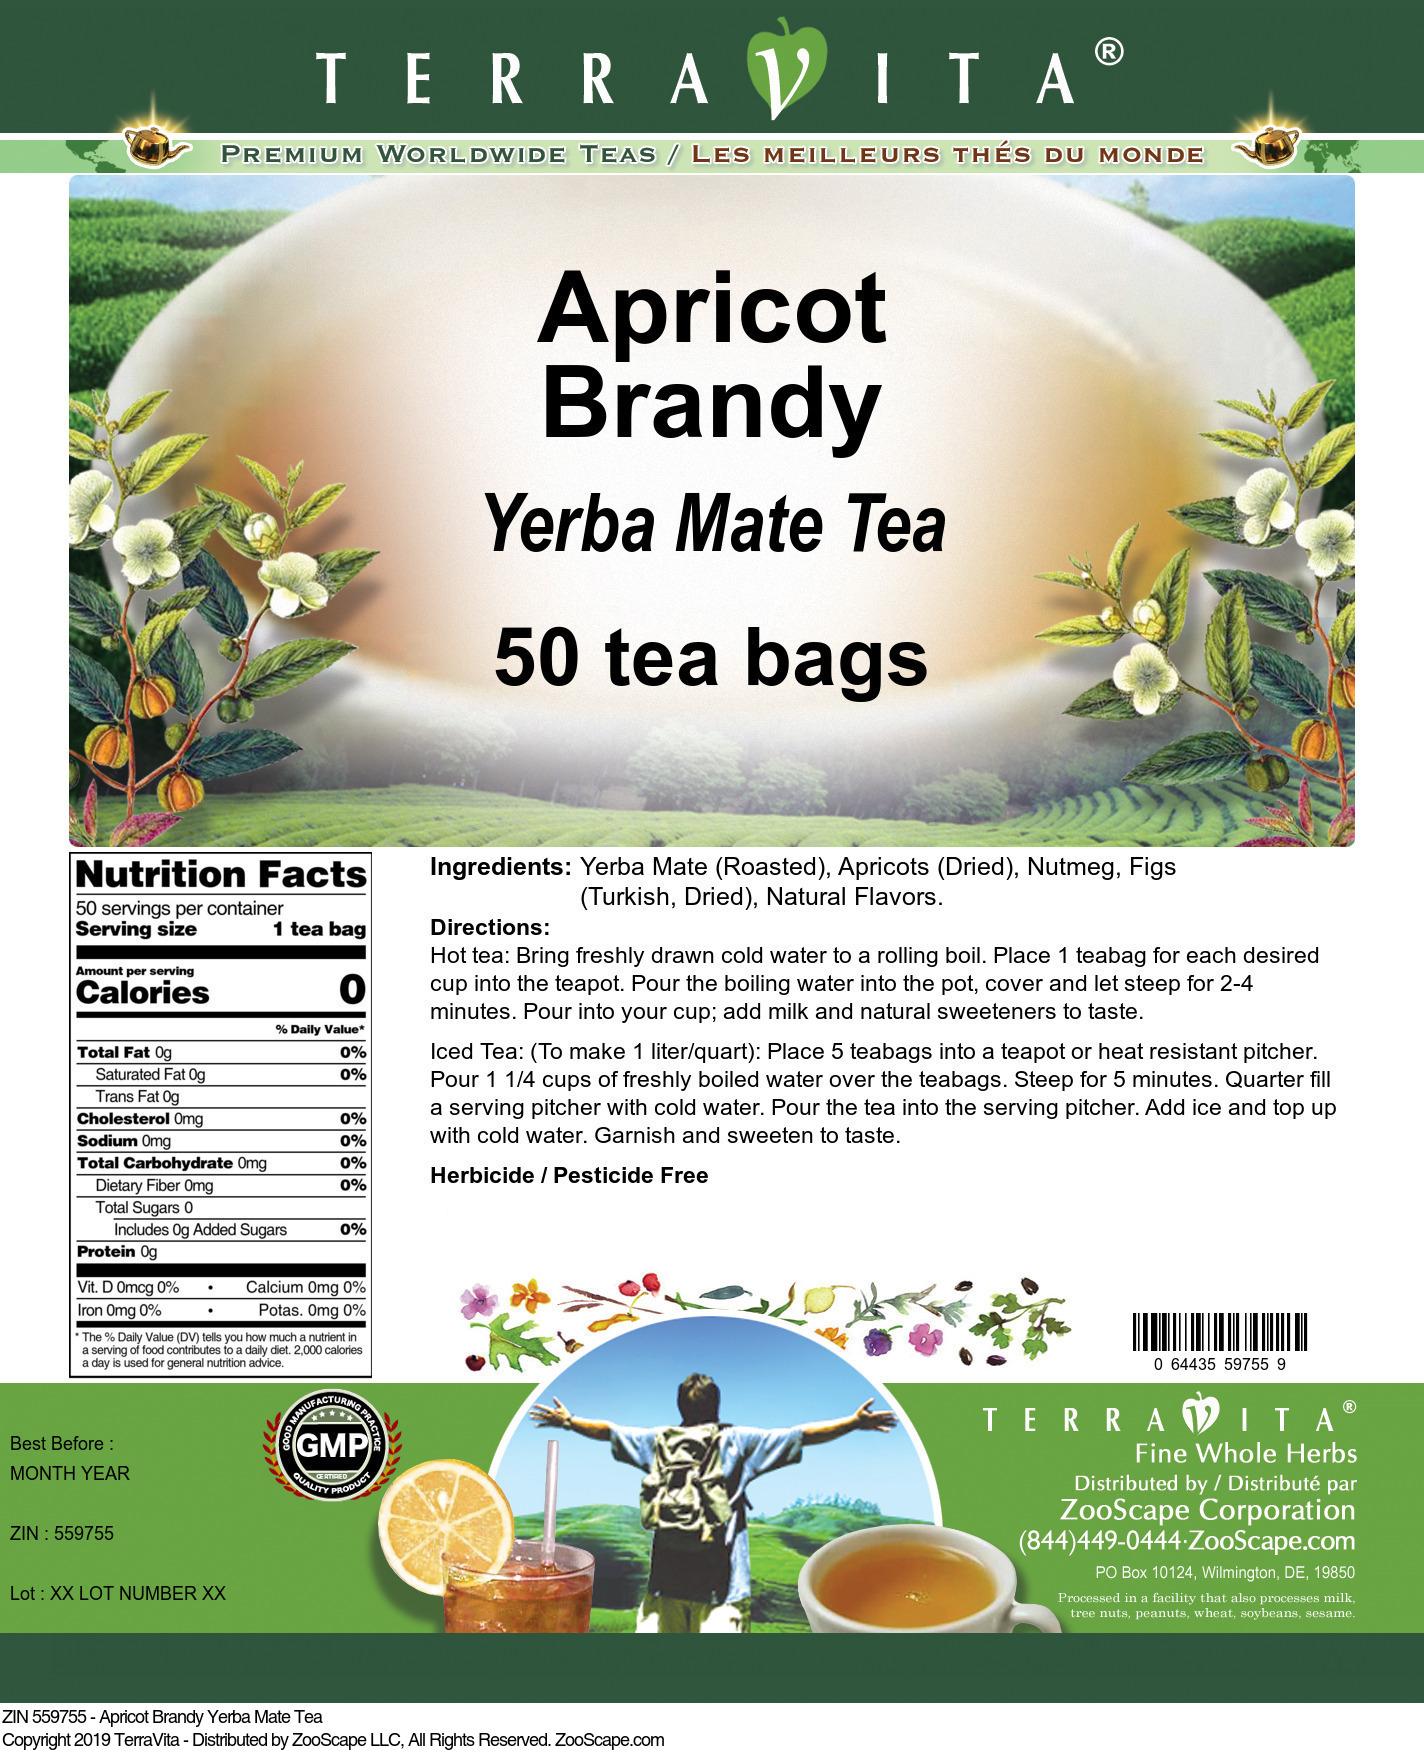 Apricot Brandy Yerba Mate Tea